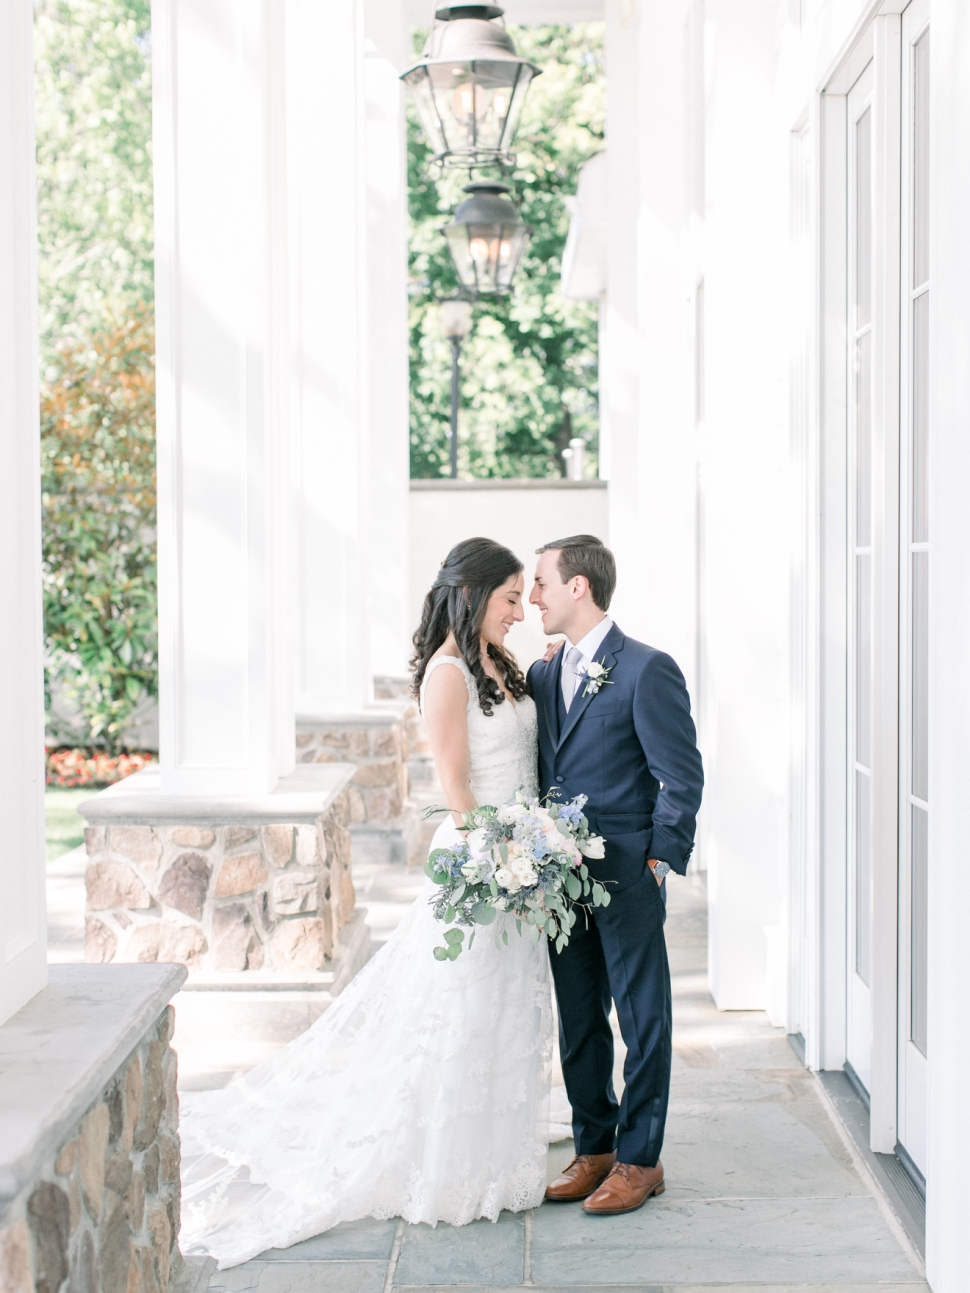 Ryland-Inn-Wedding-Photographer-Cassi-Claire_Ryland-Inn-Wedding_28.jpg